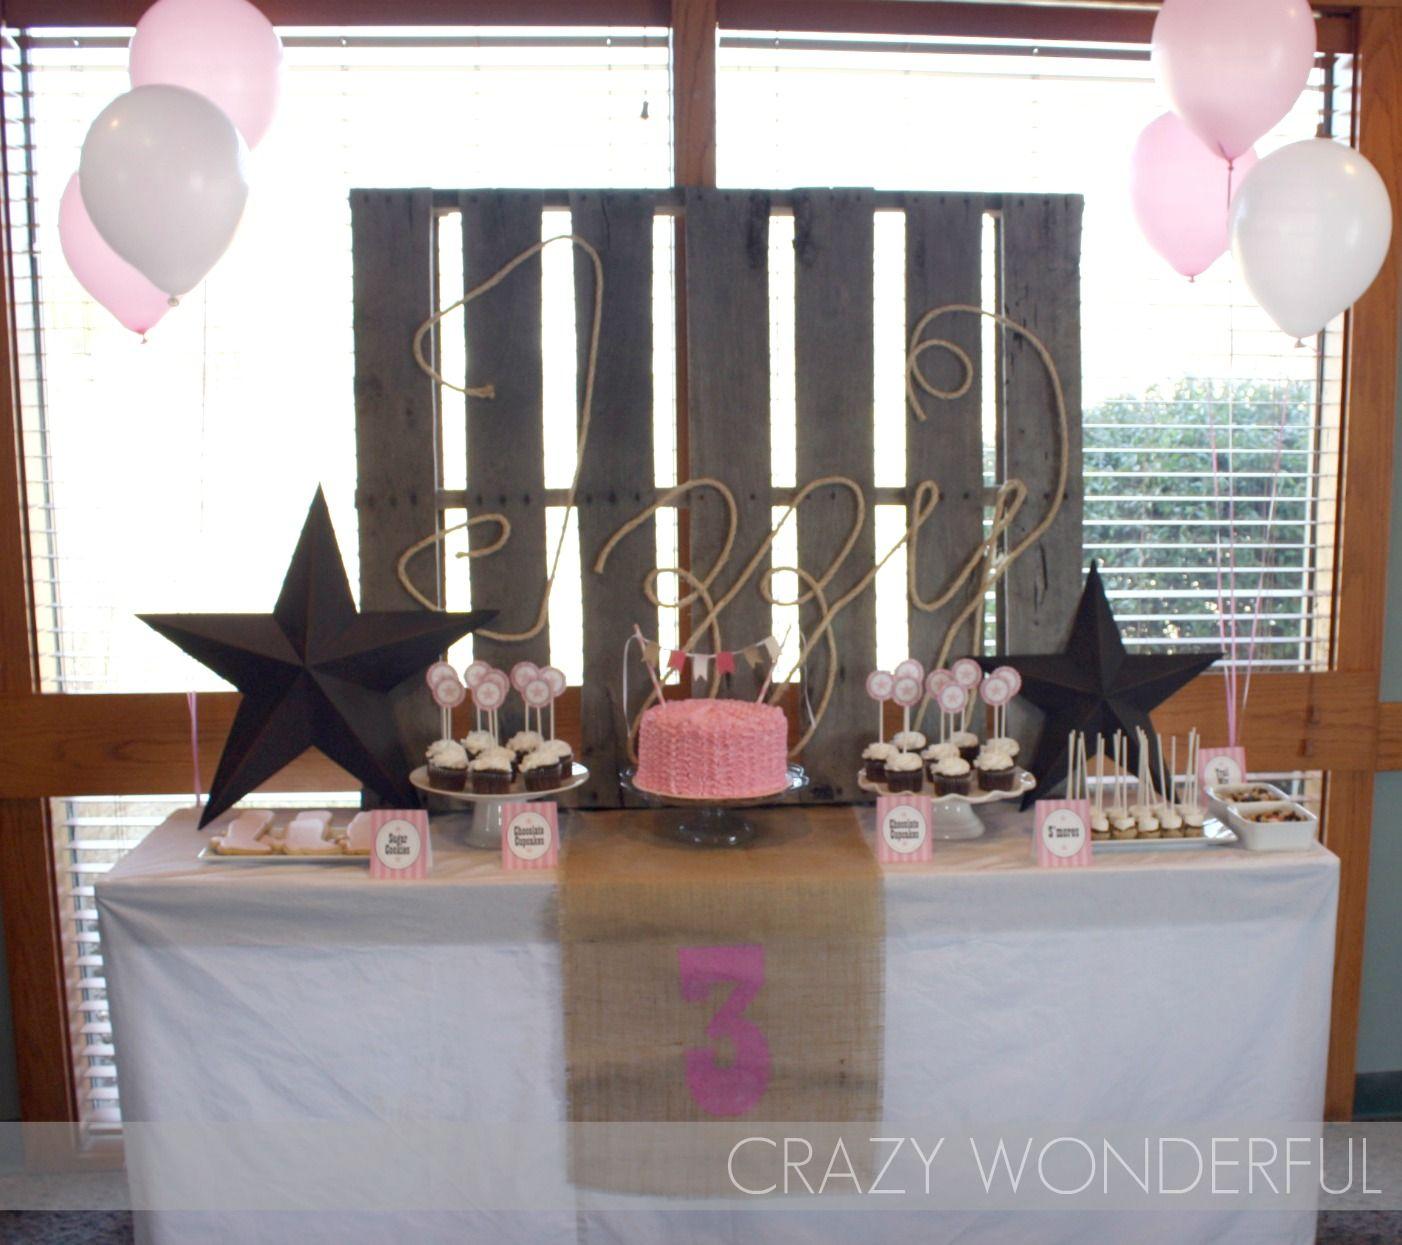 Cowgirl Birthday Decorations Google Image Result For Http 1bpblogspotcom Id Cgs4gsug